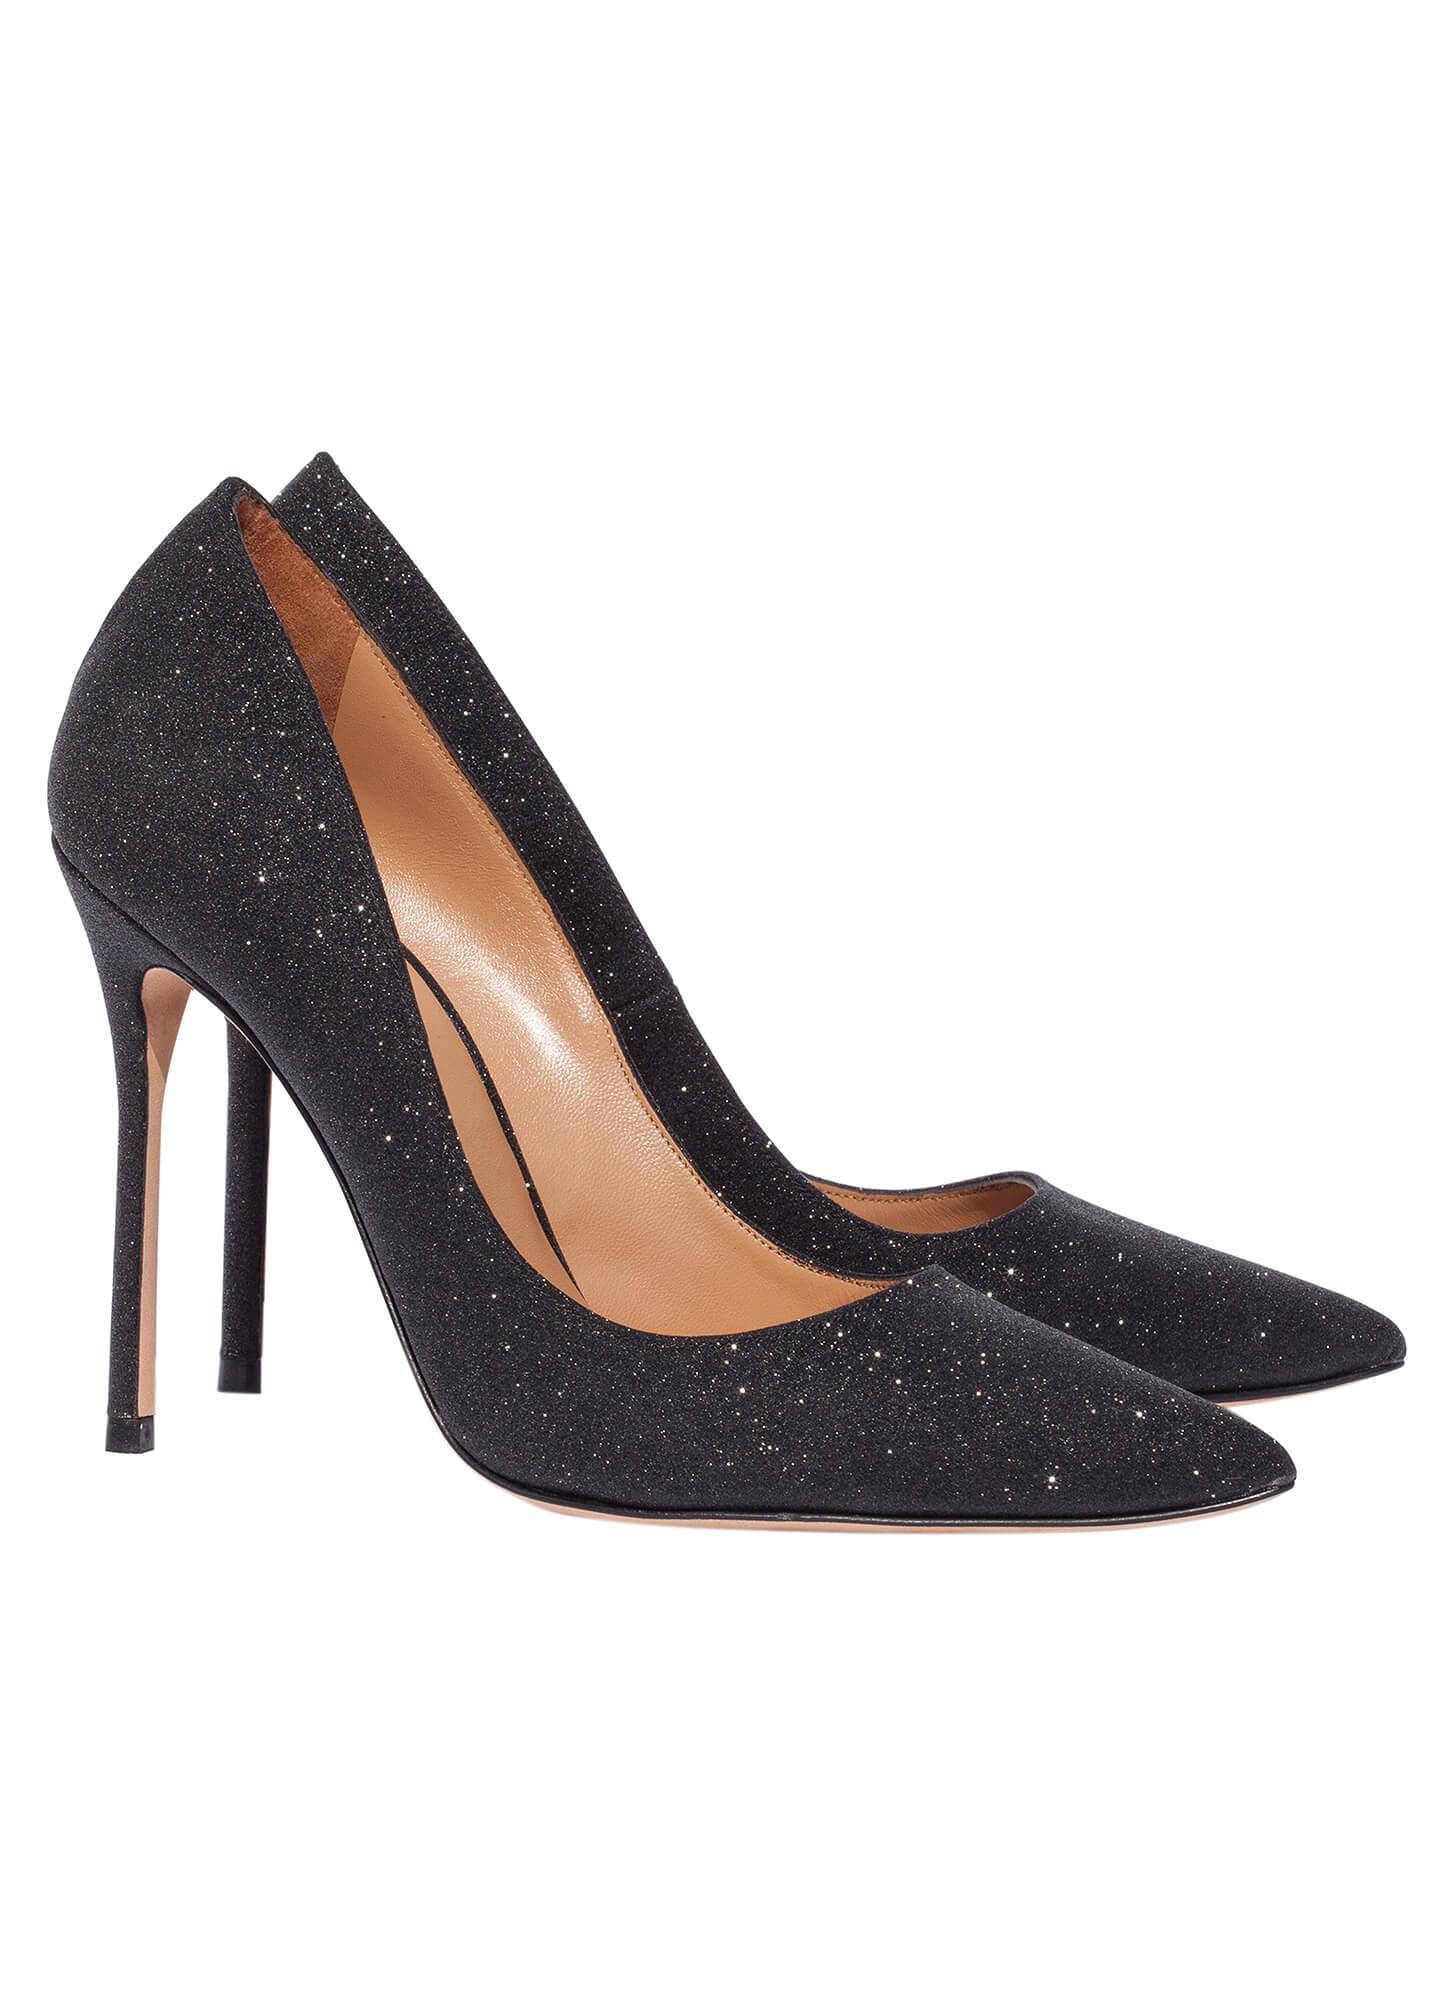 black-evening-heeled-pumps-pura-lopez-kameron.jpg